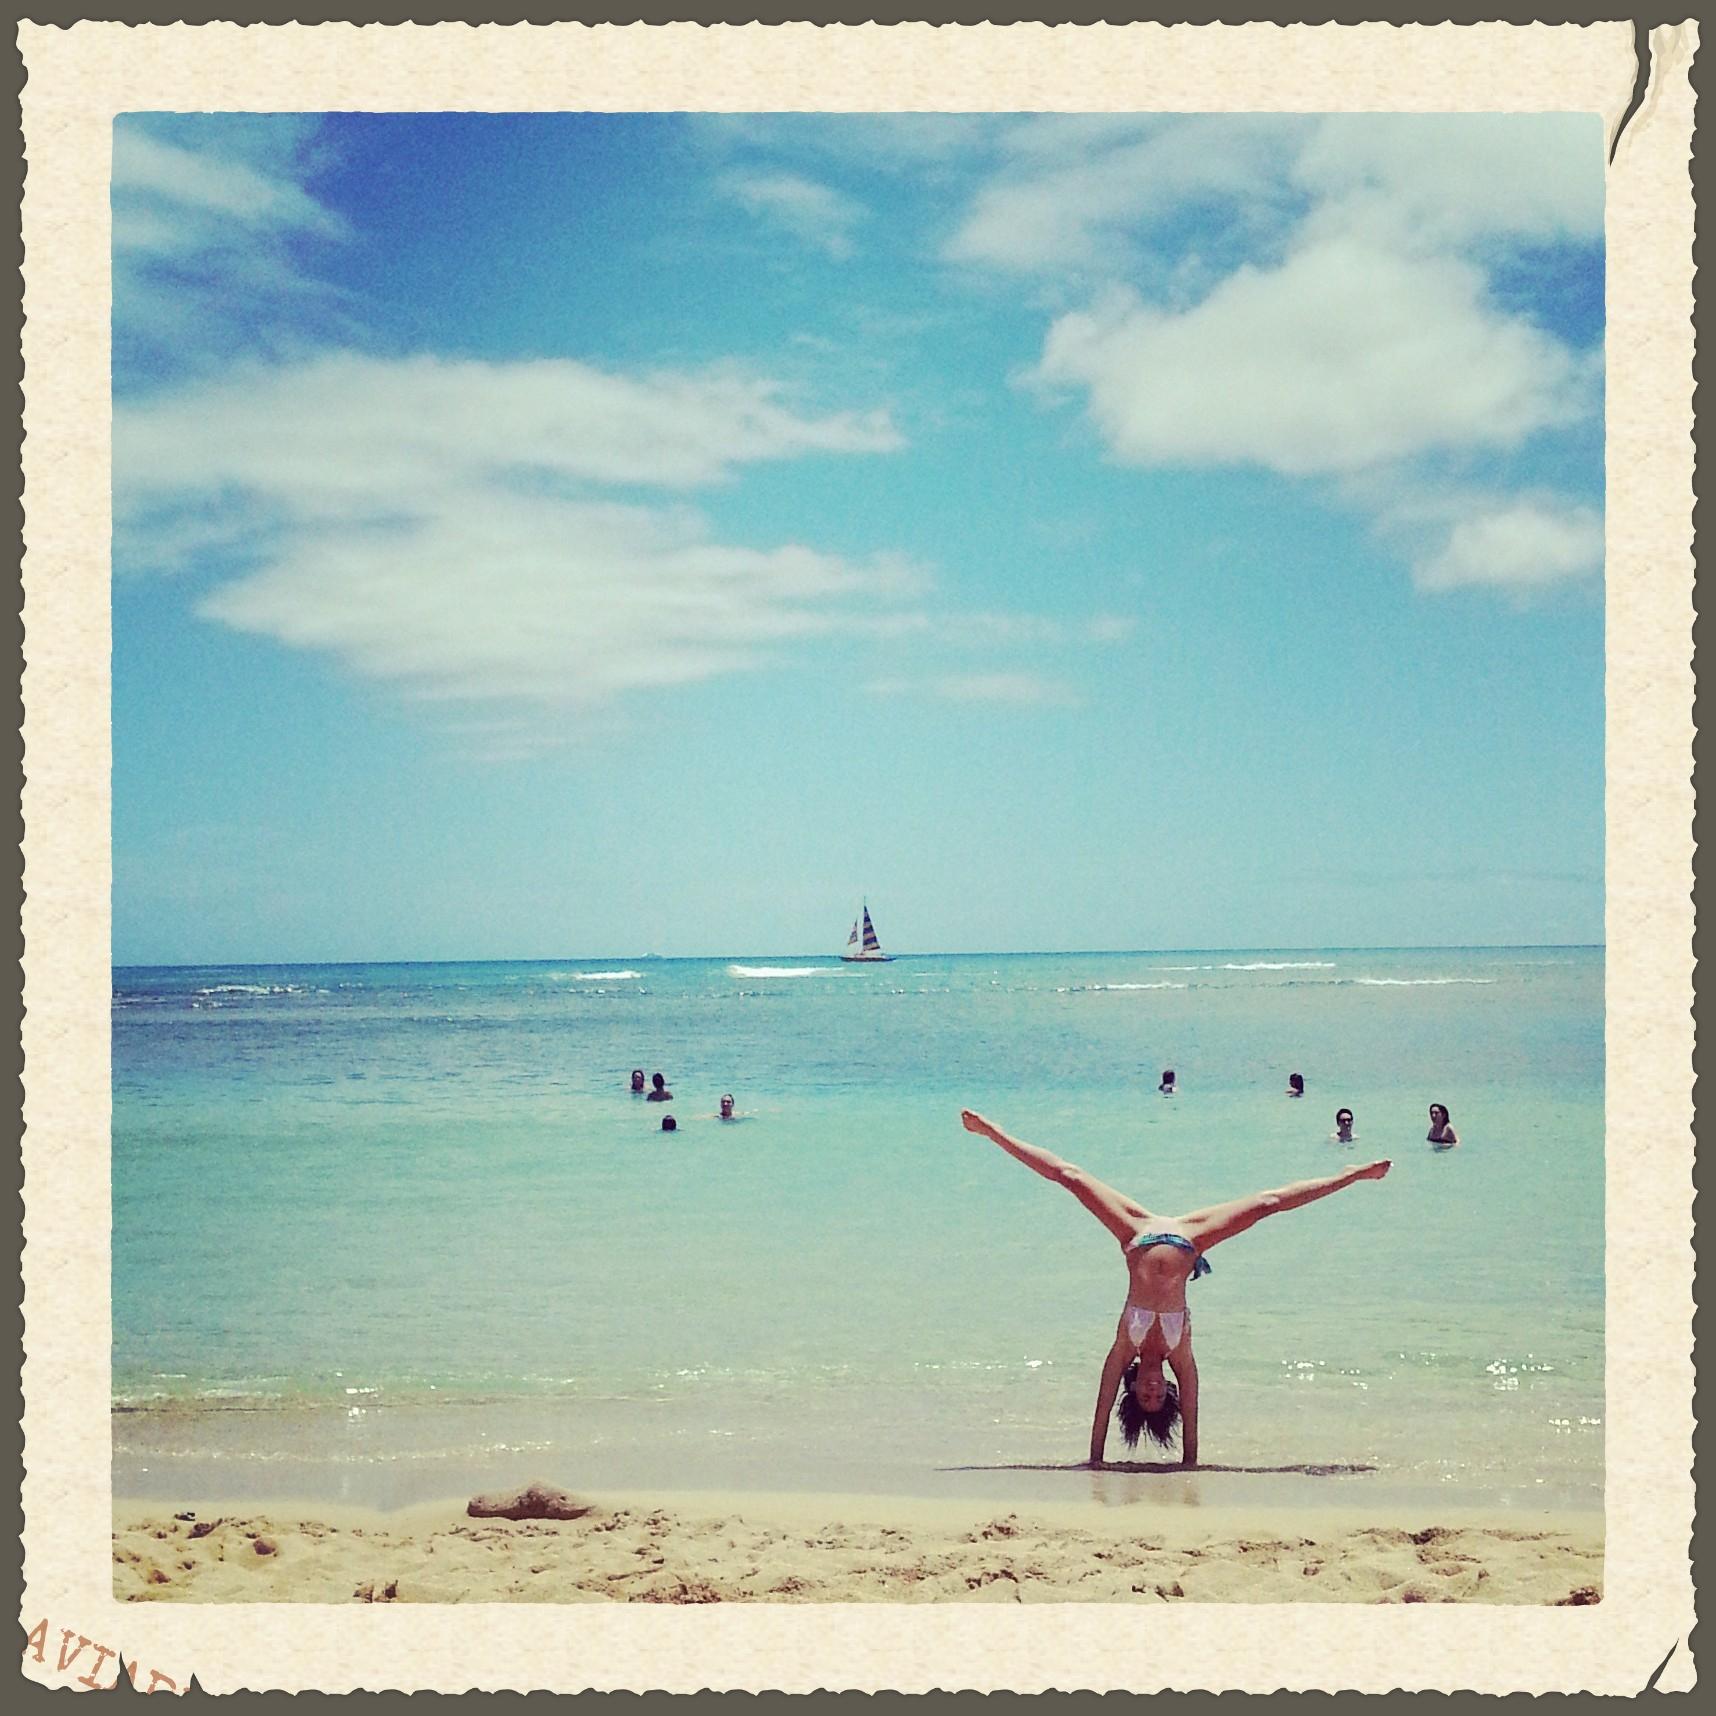 My personal birthday tradition is to take a cartwheel photo. Waikiki, age 29.